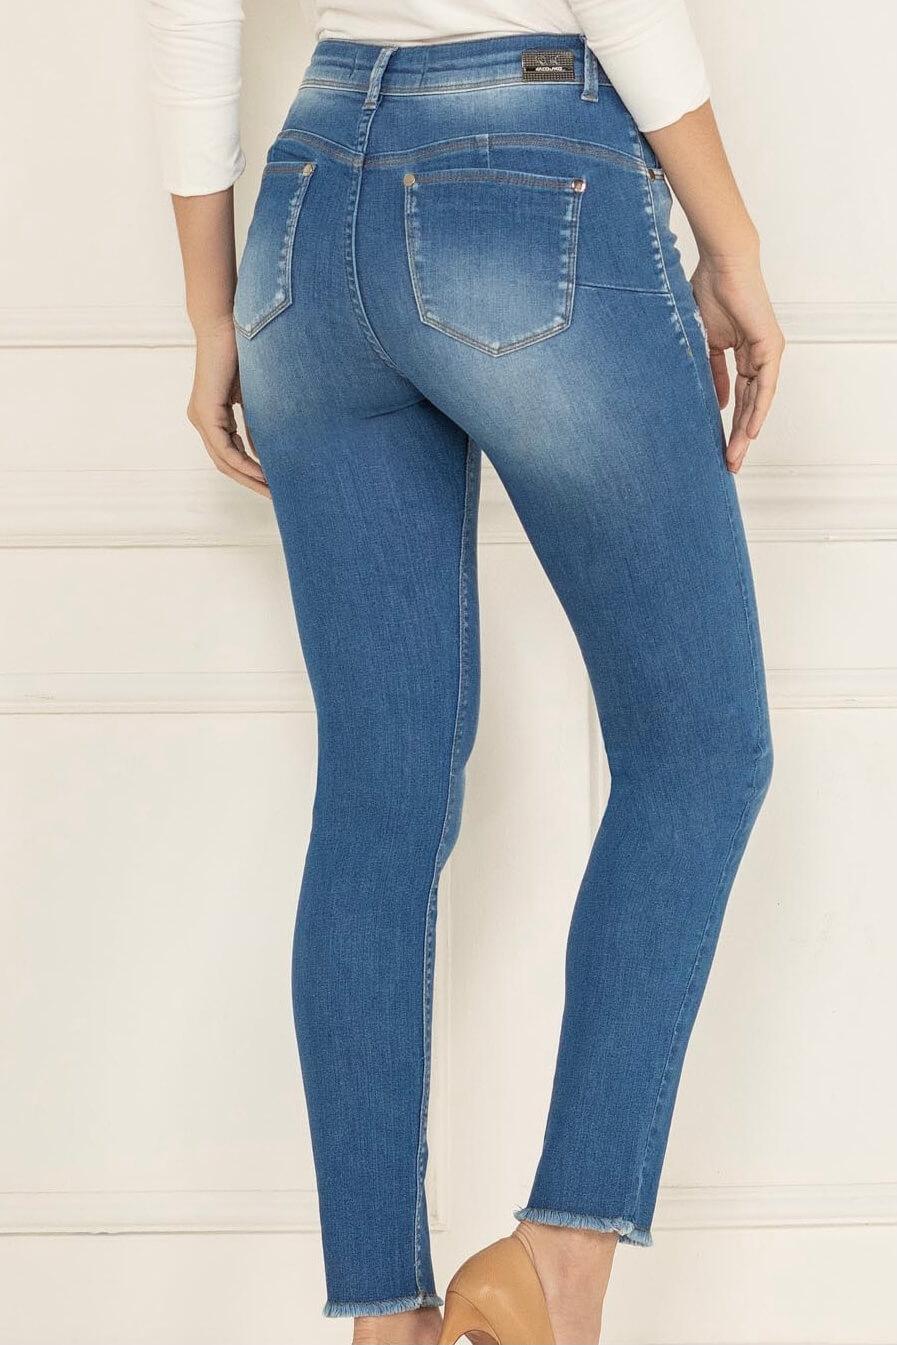 Calça Jegging Lycra Levanta Bumbum Jeans Feminino K34849 - KACOLAKO